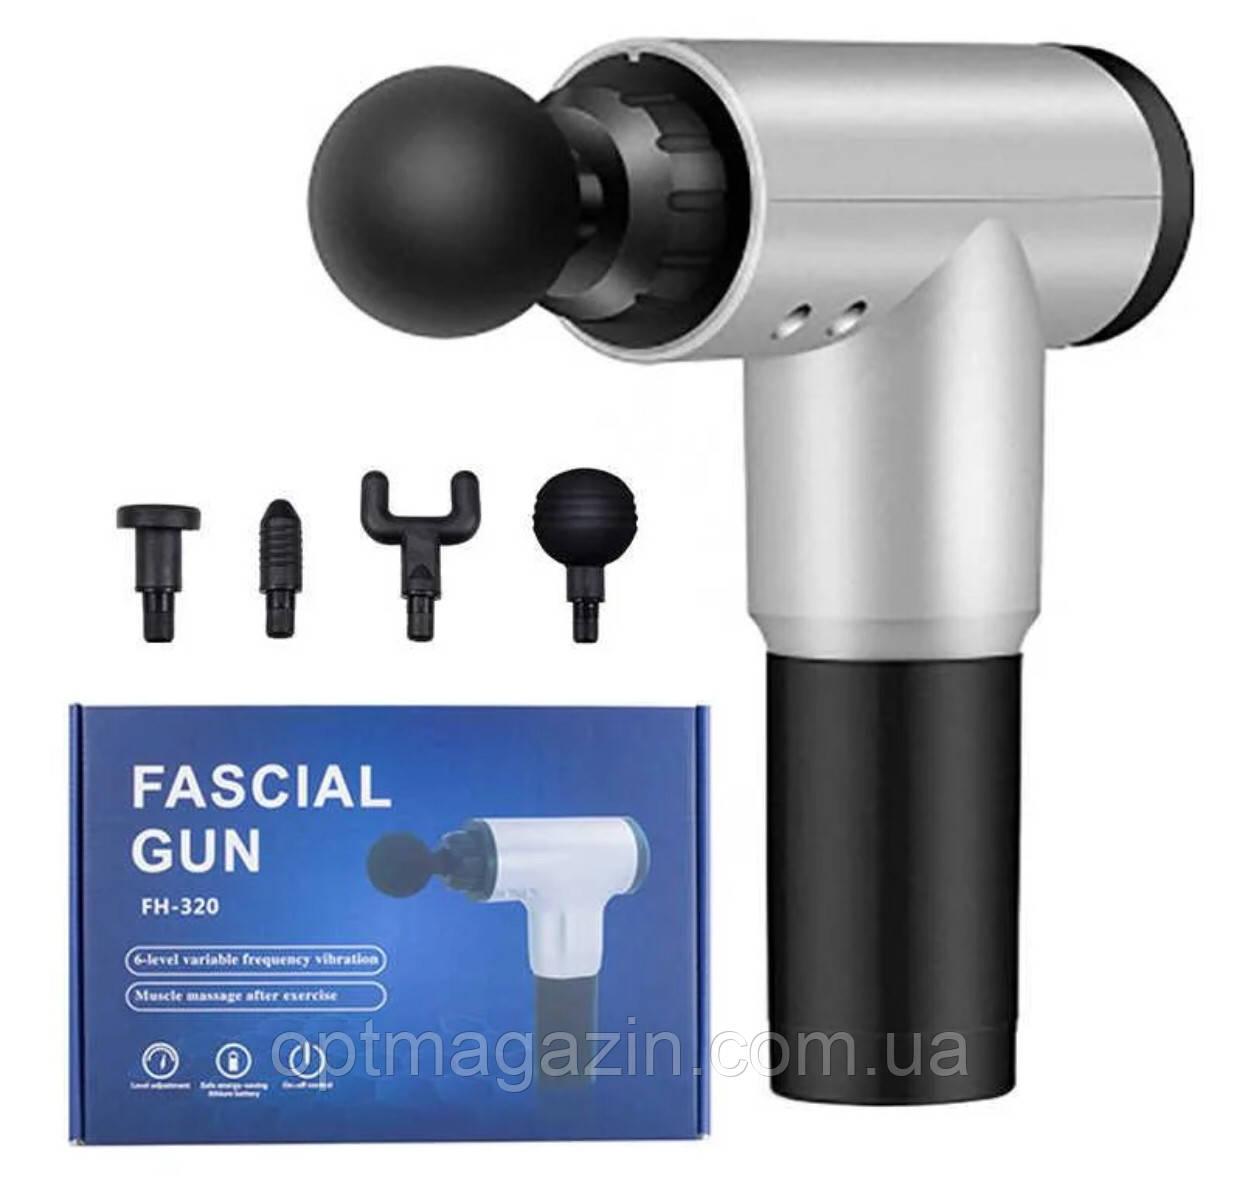 Вибрационный массажер для тела Fascial Gun CY 801 Health